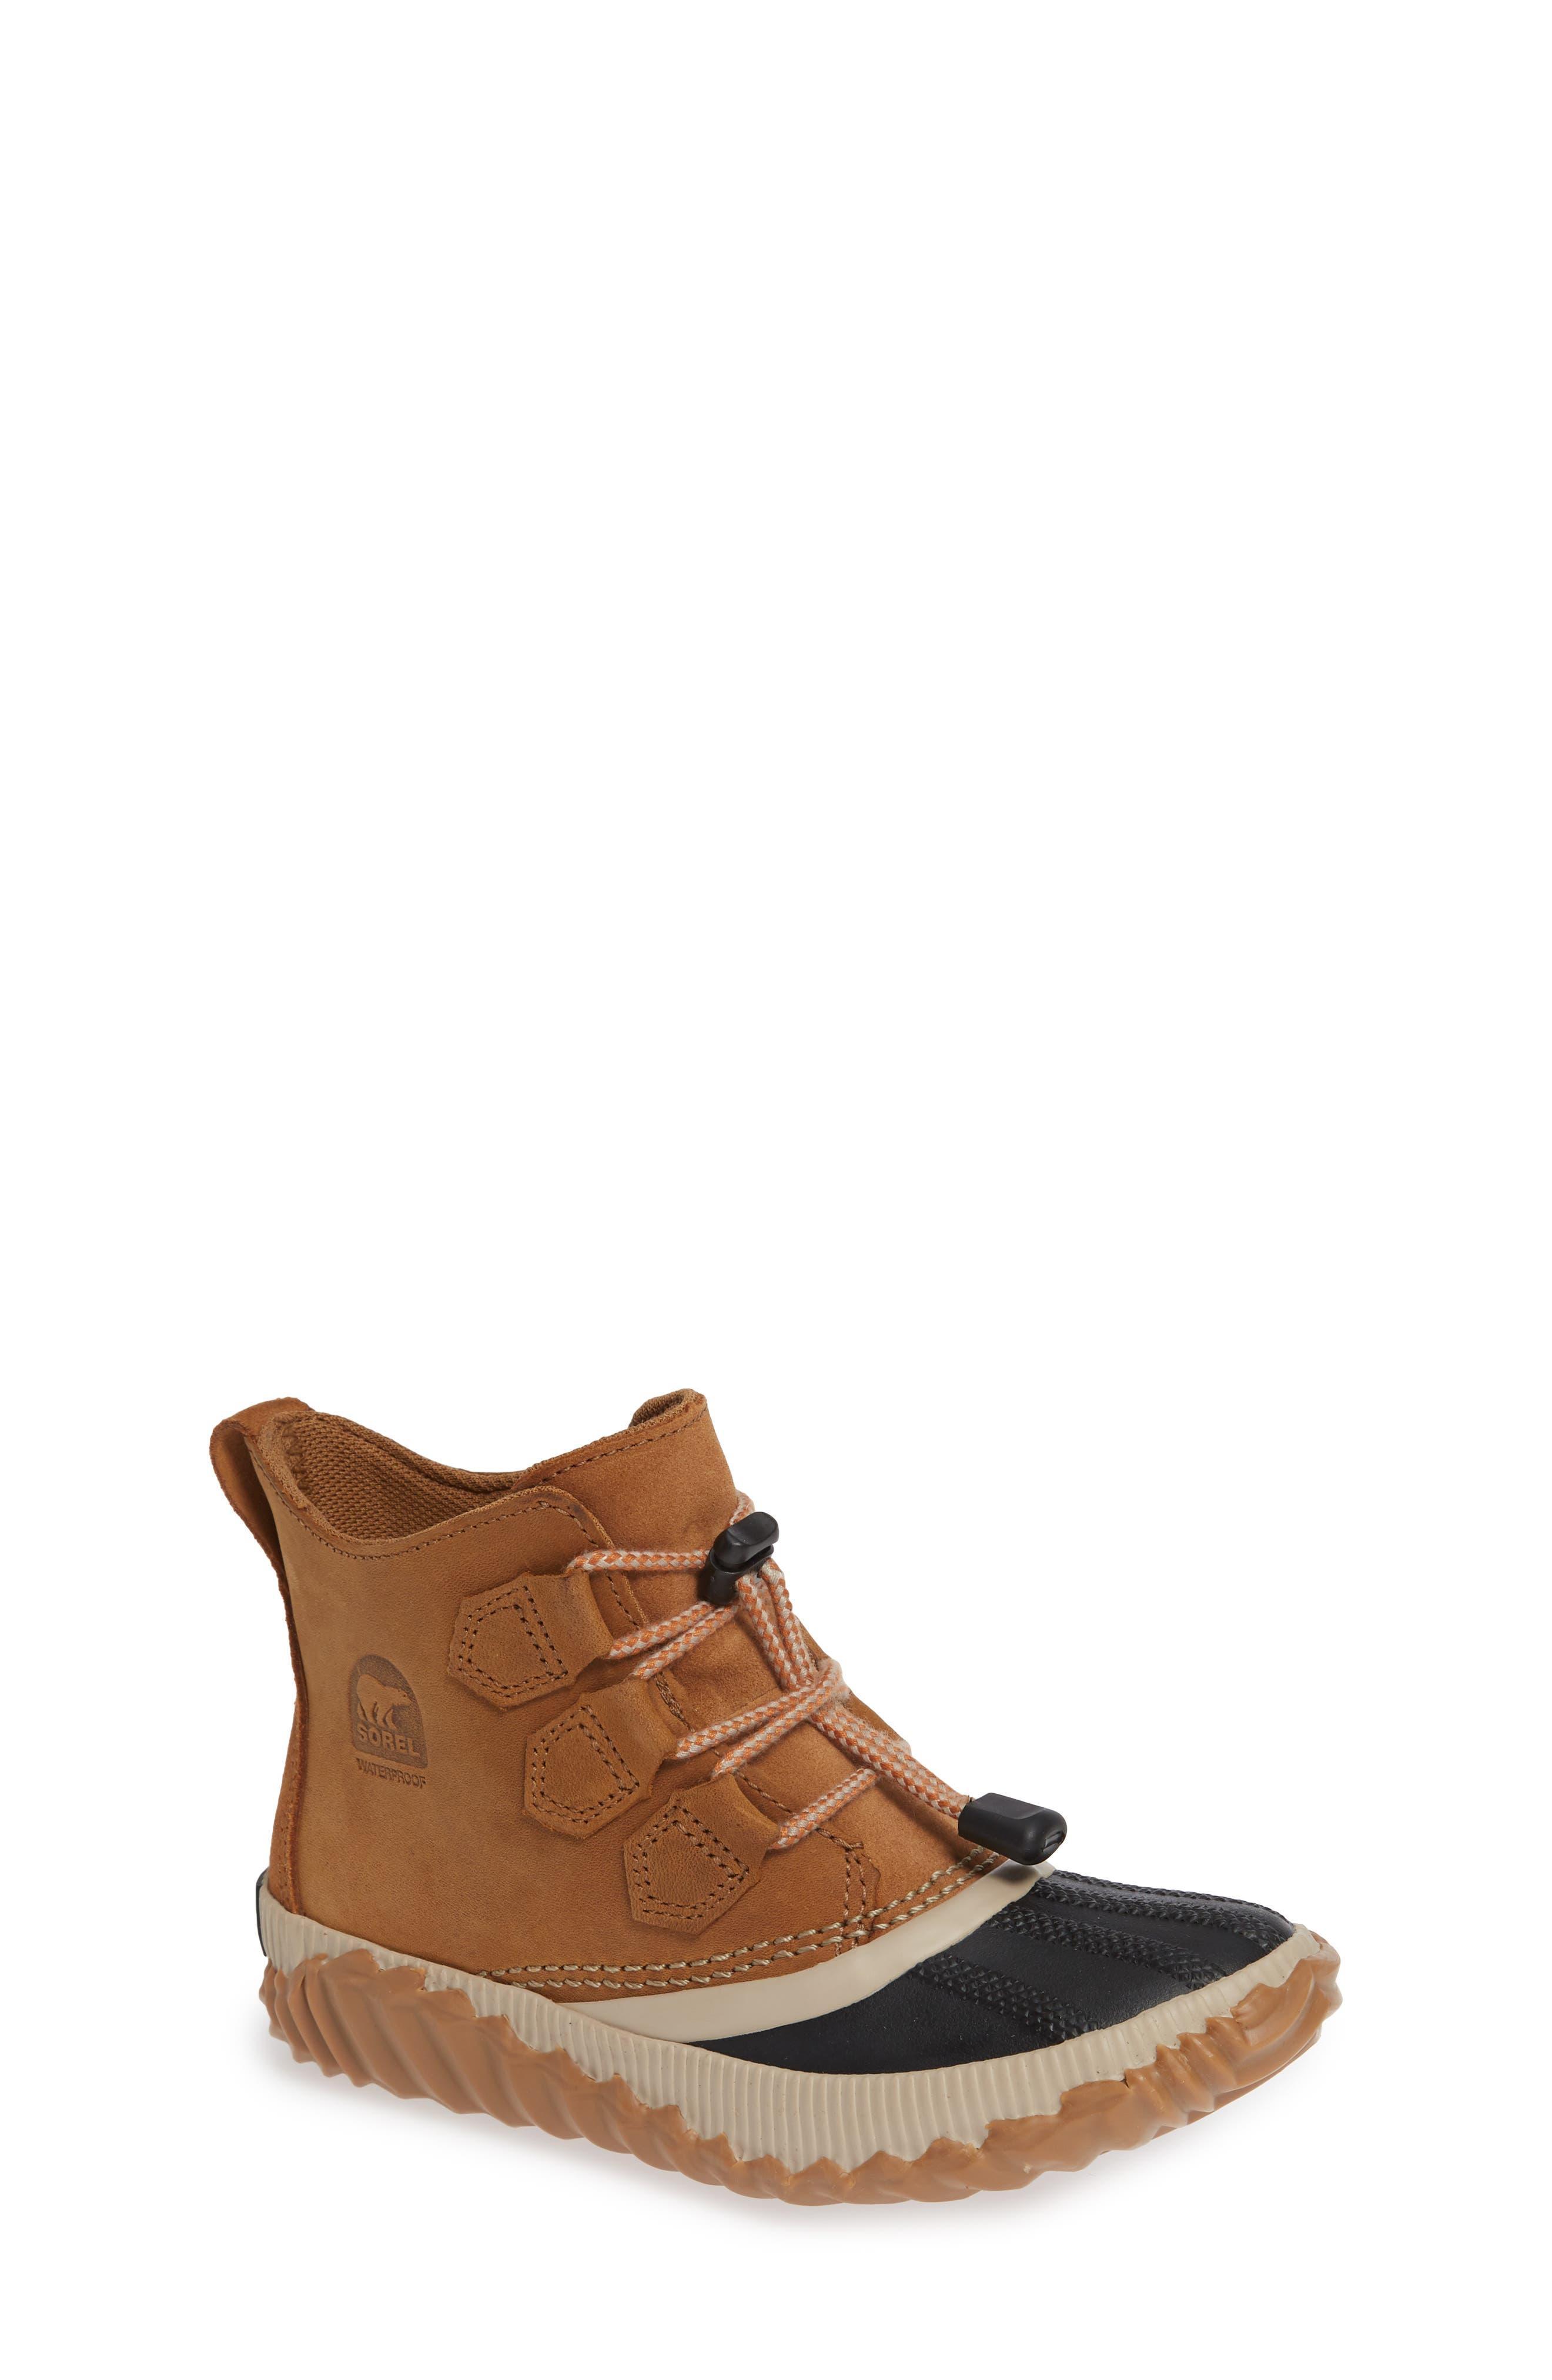 Out N About Plus Waterproof Boot,                         Main,                         color, ELK/ BLACK